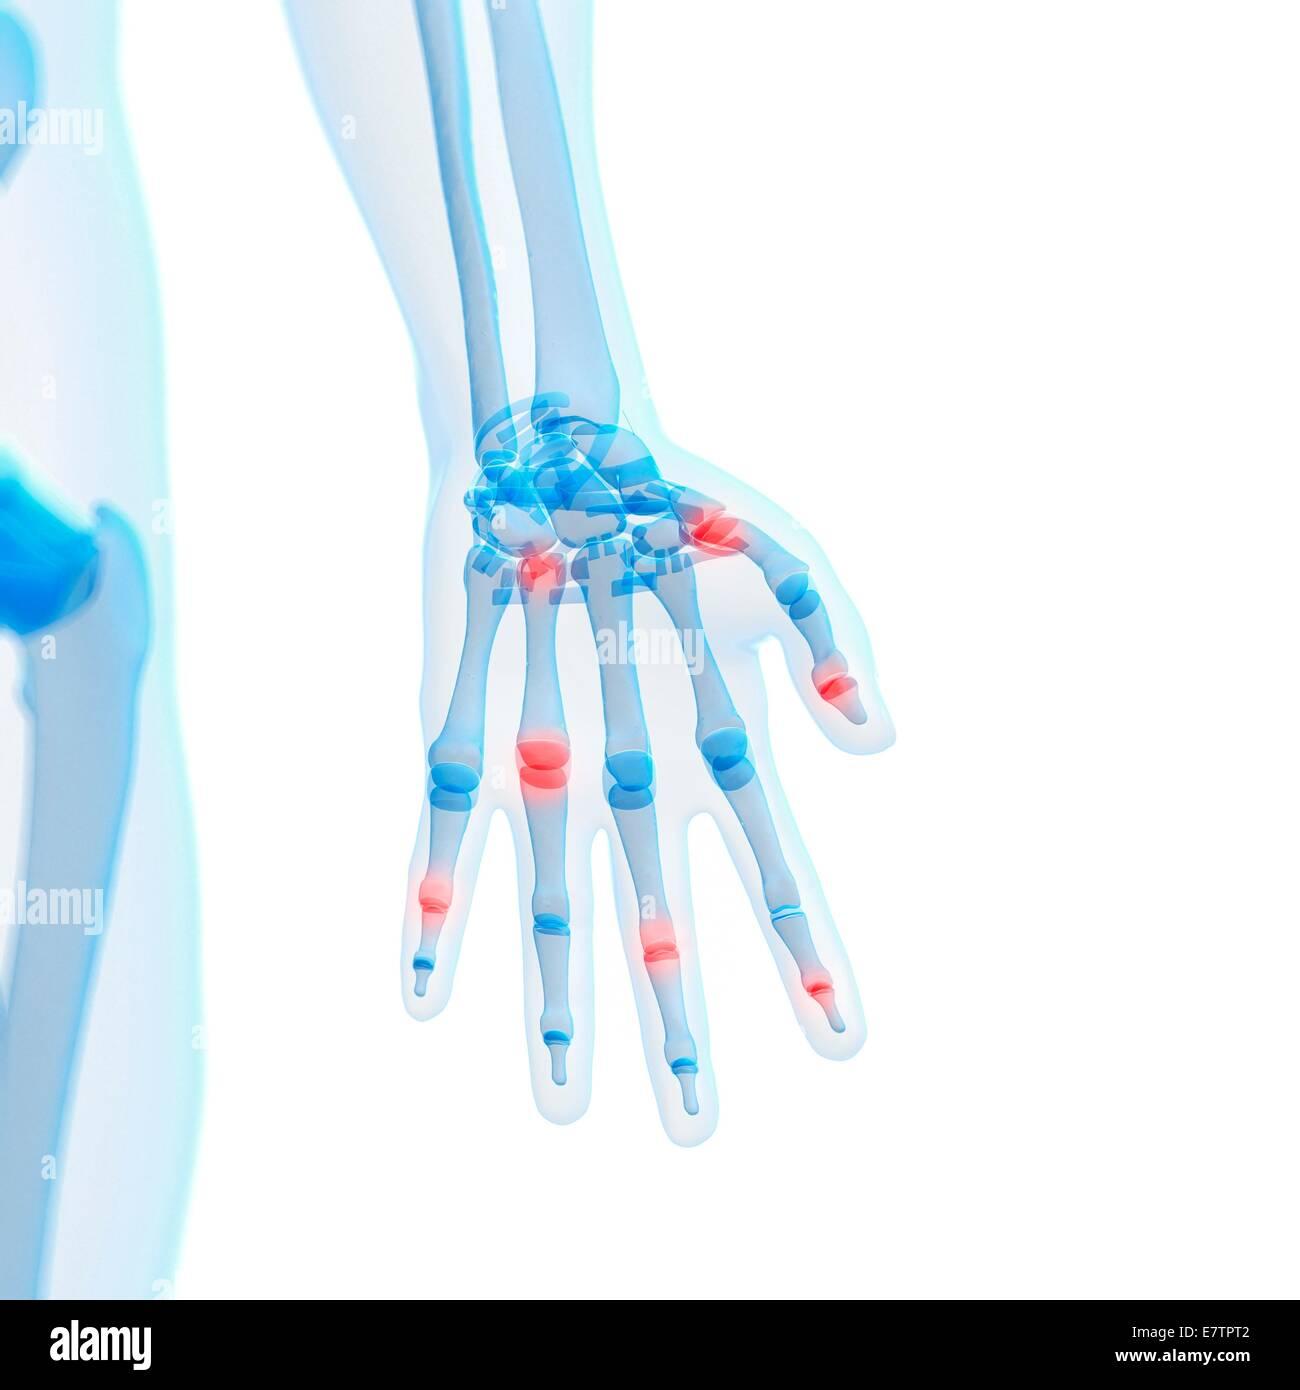 Hand Three Fingers White Stockfotos & Hand Three Fingers White ...